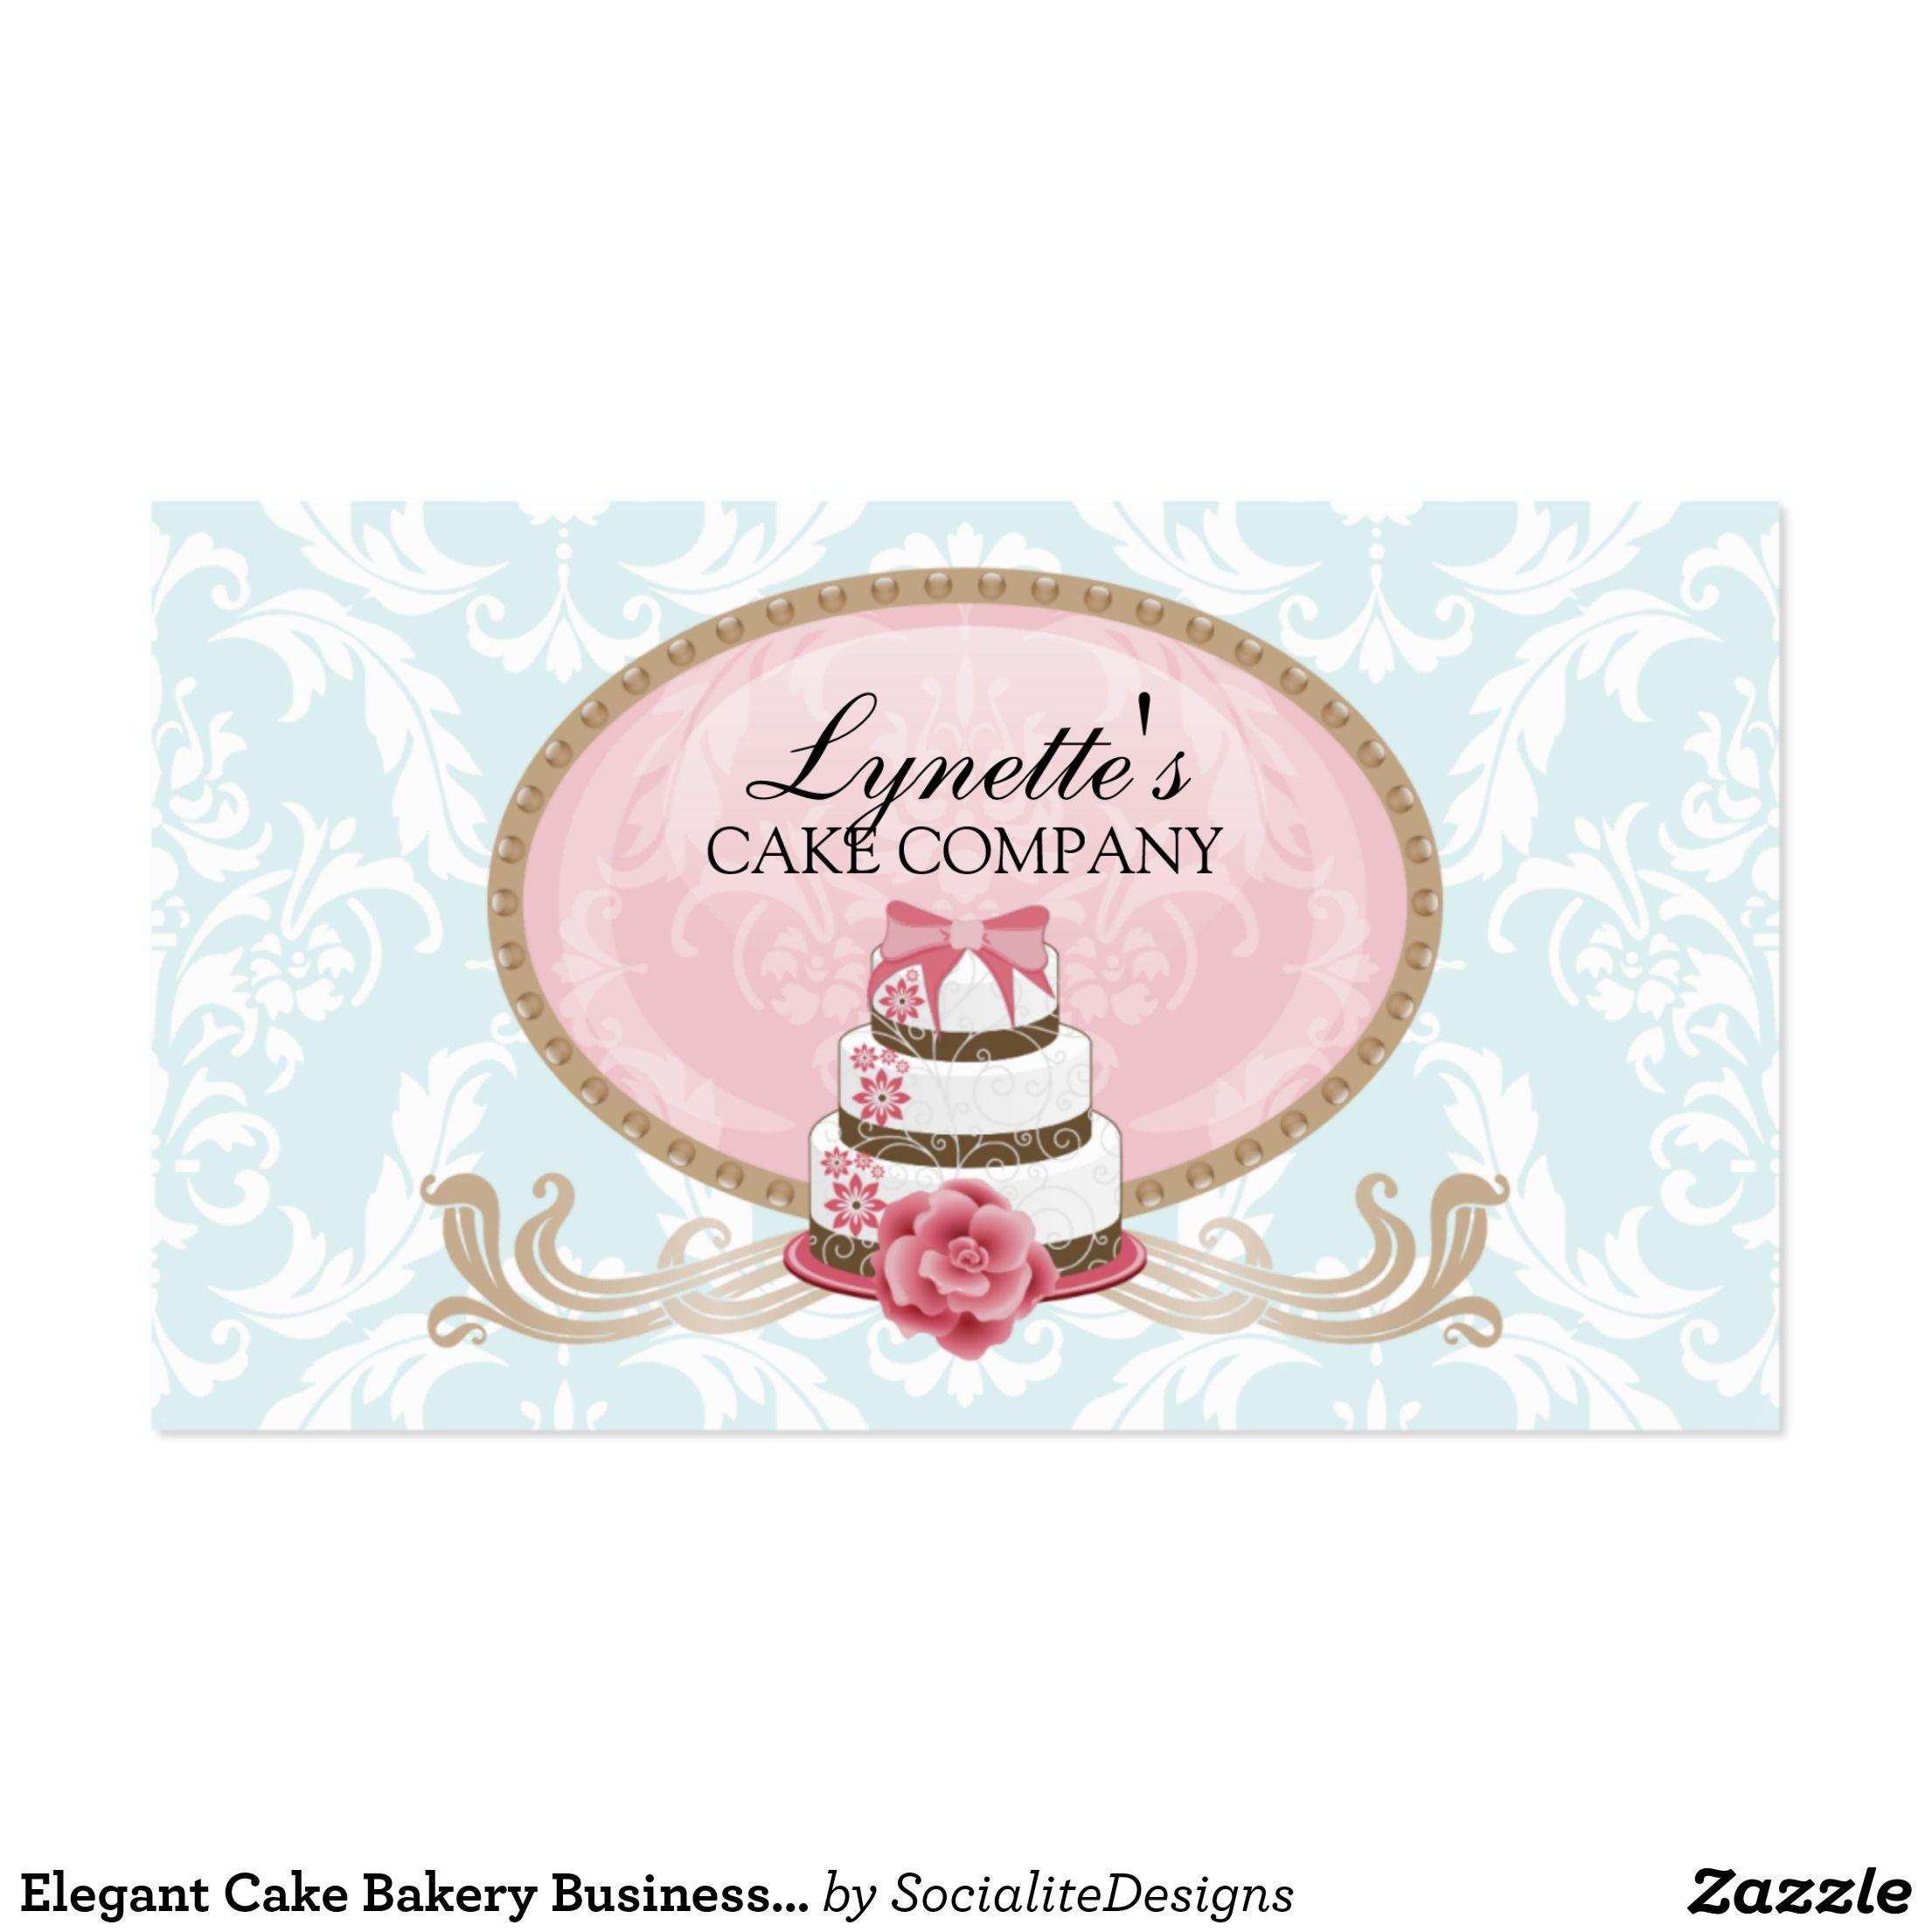 cake design business cards 100 images tomato design emily